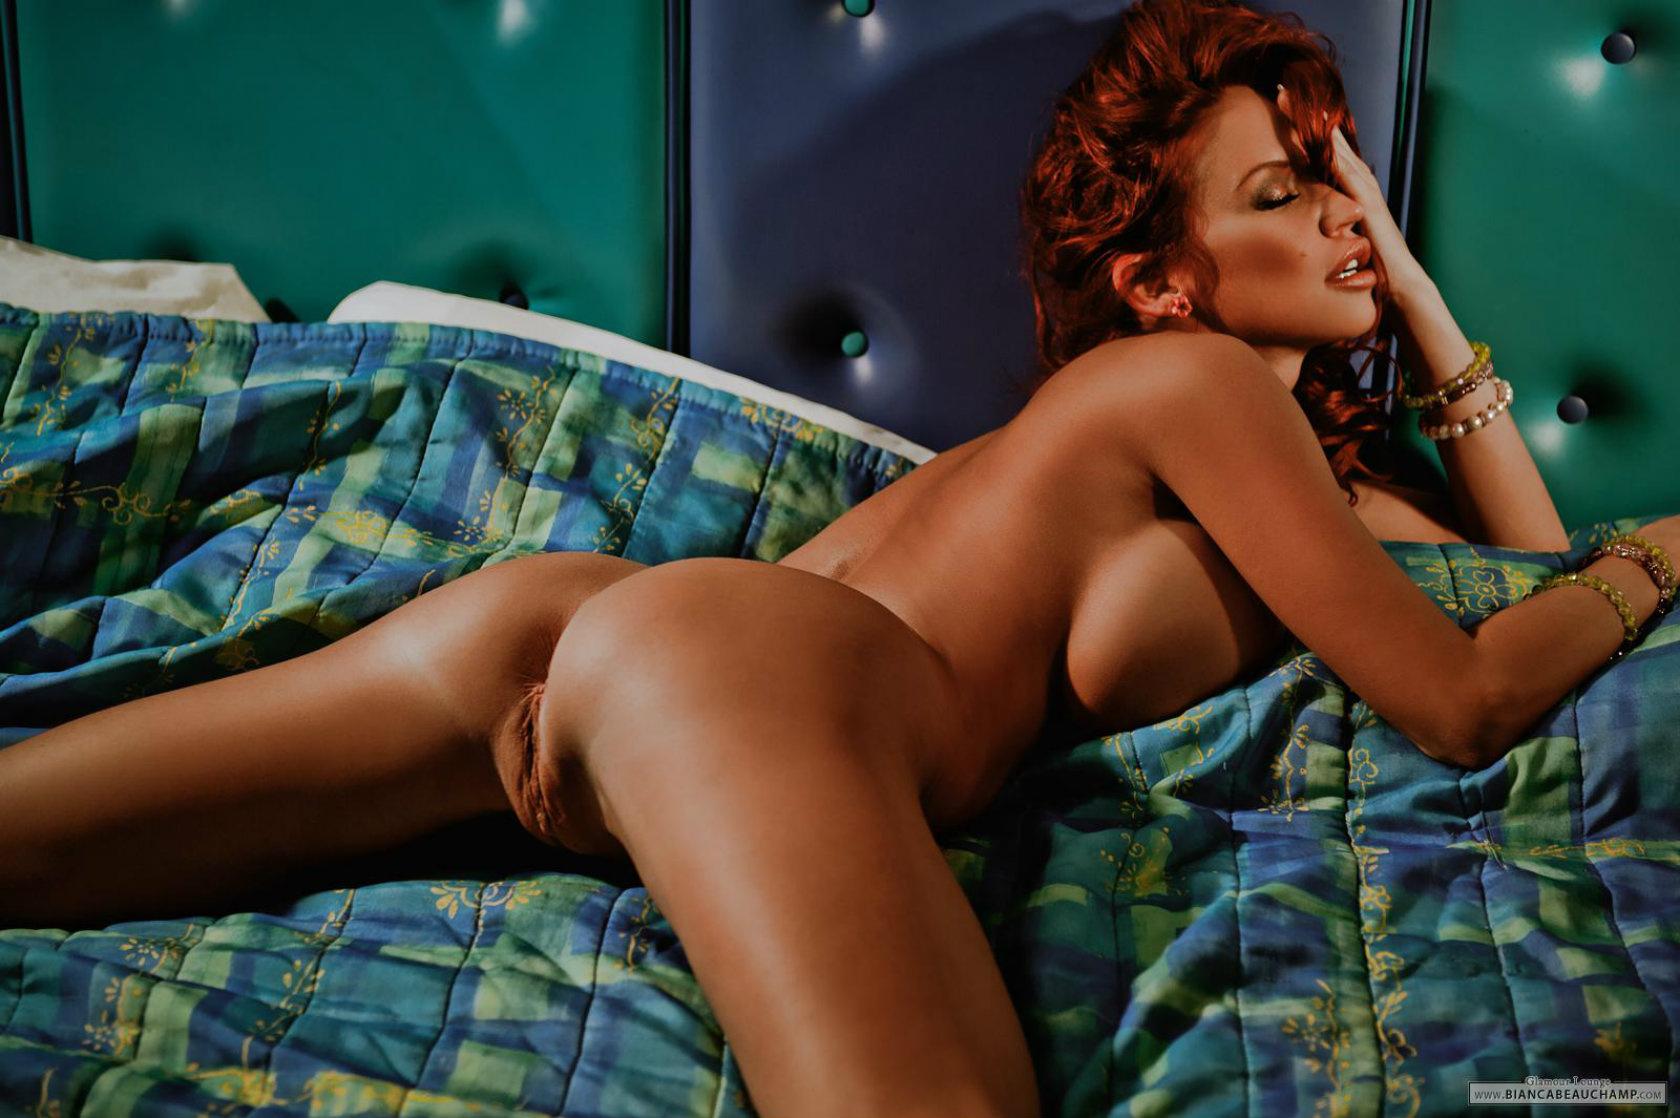 pussy Bianca beauchamp nude